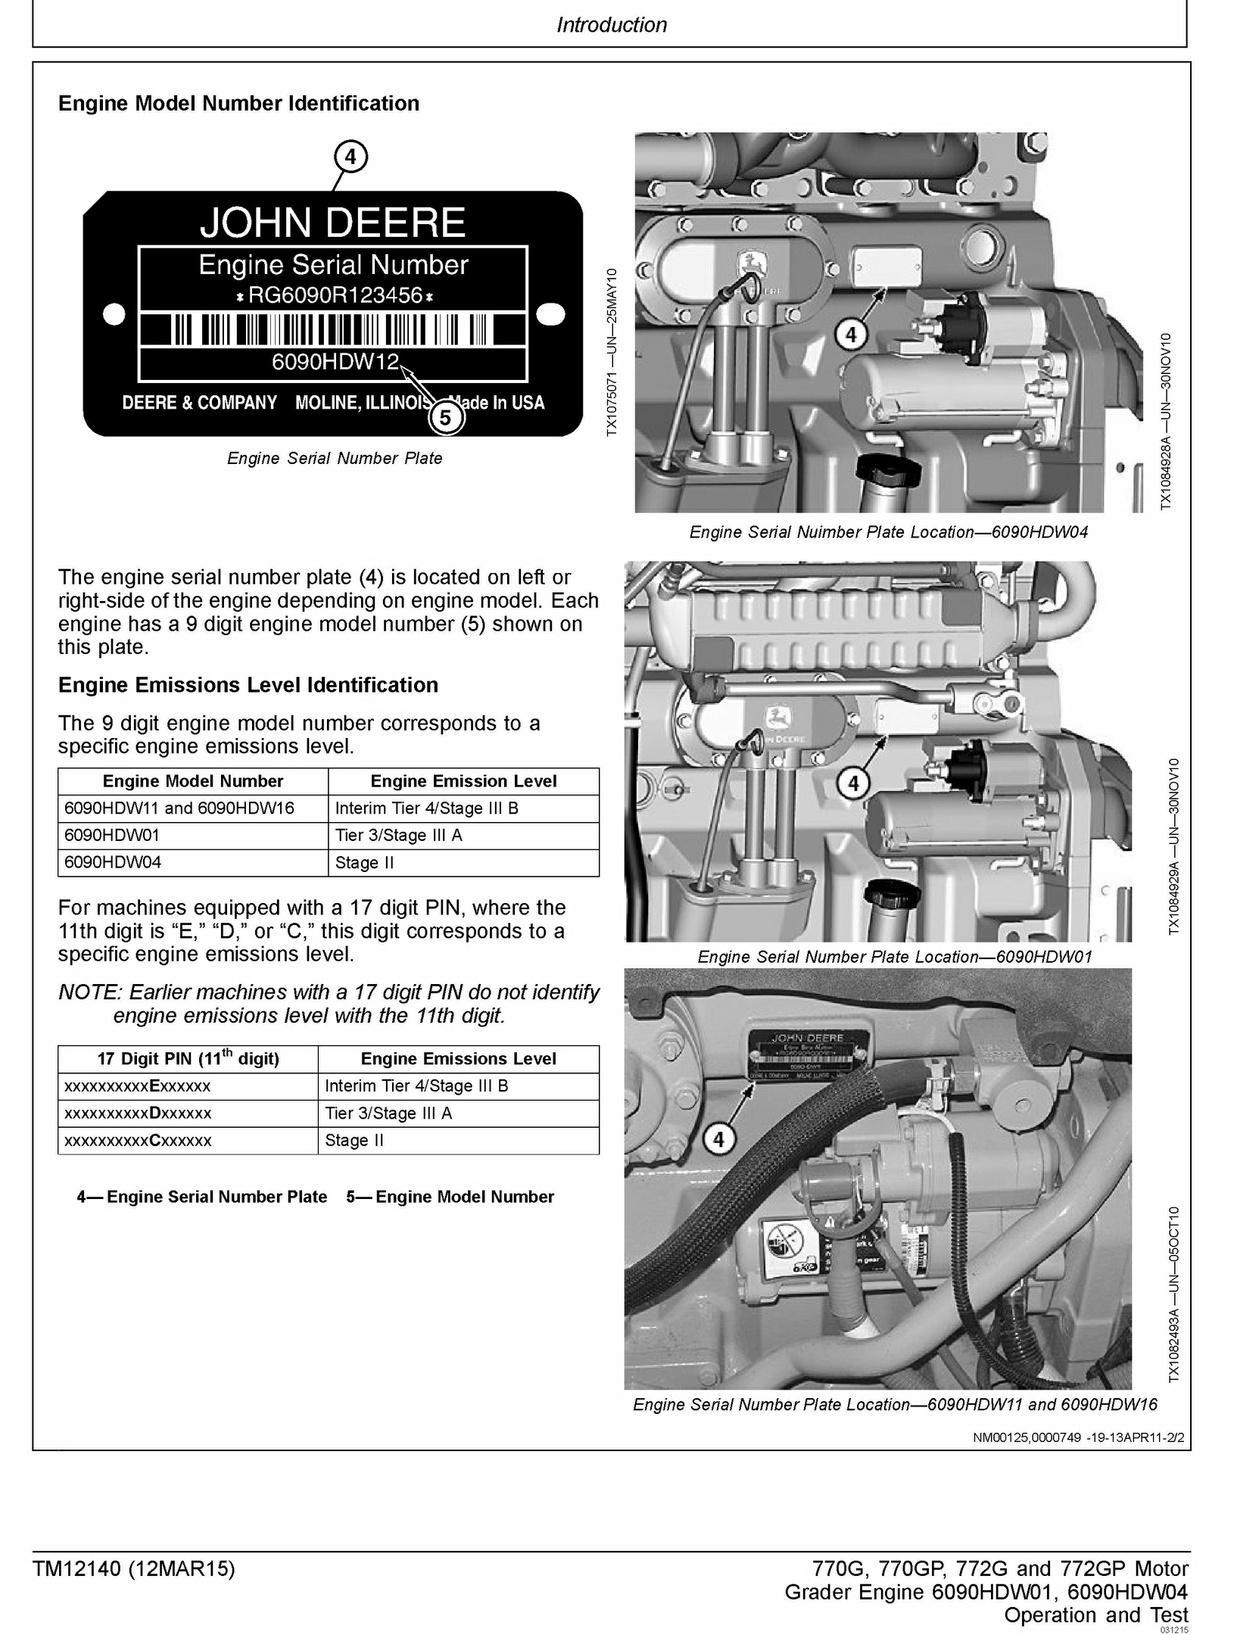 PDF JOHN DEERE 770G 770GP 772G 772GP MOTOR GRADER OPERATION AND TEST MANUAL TM12140